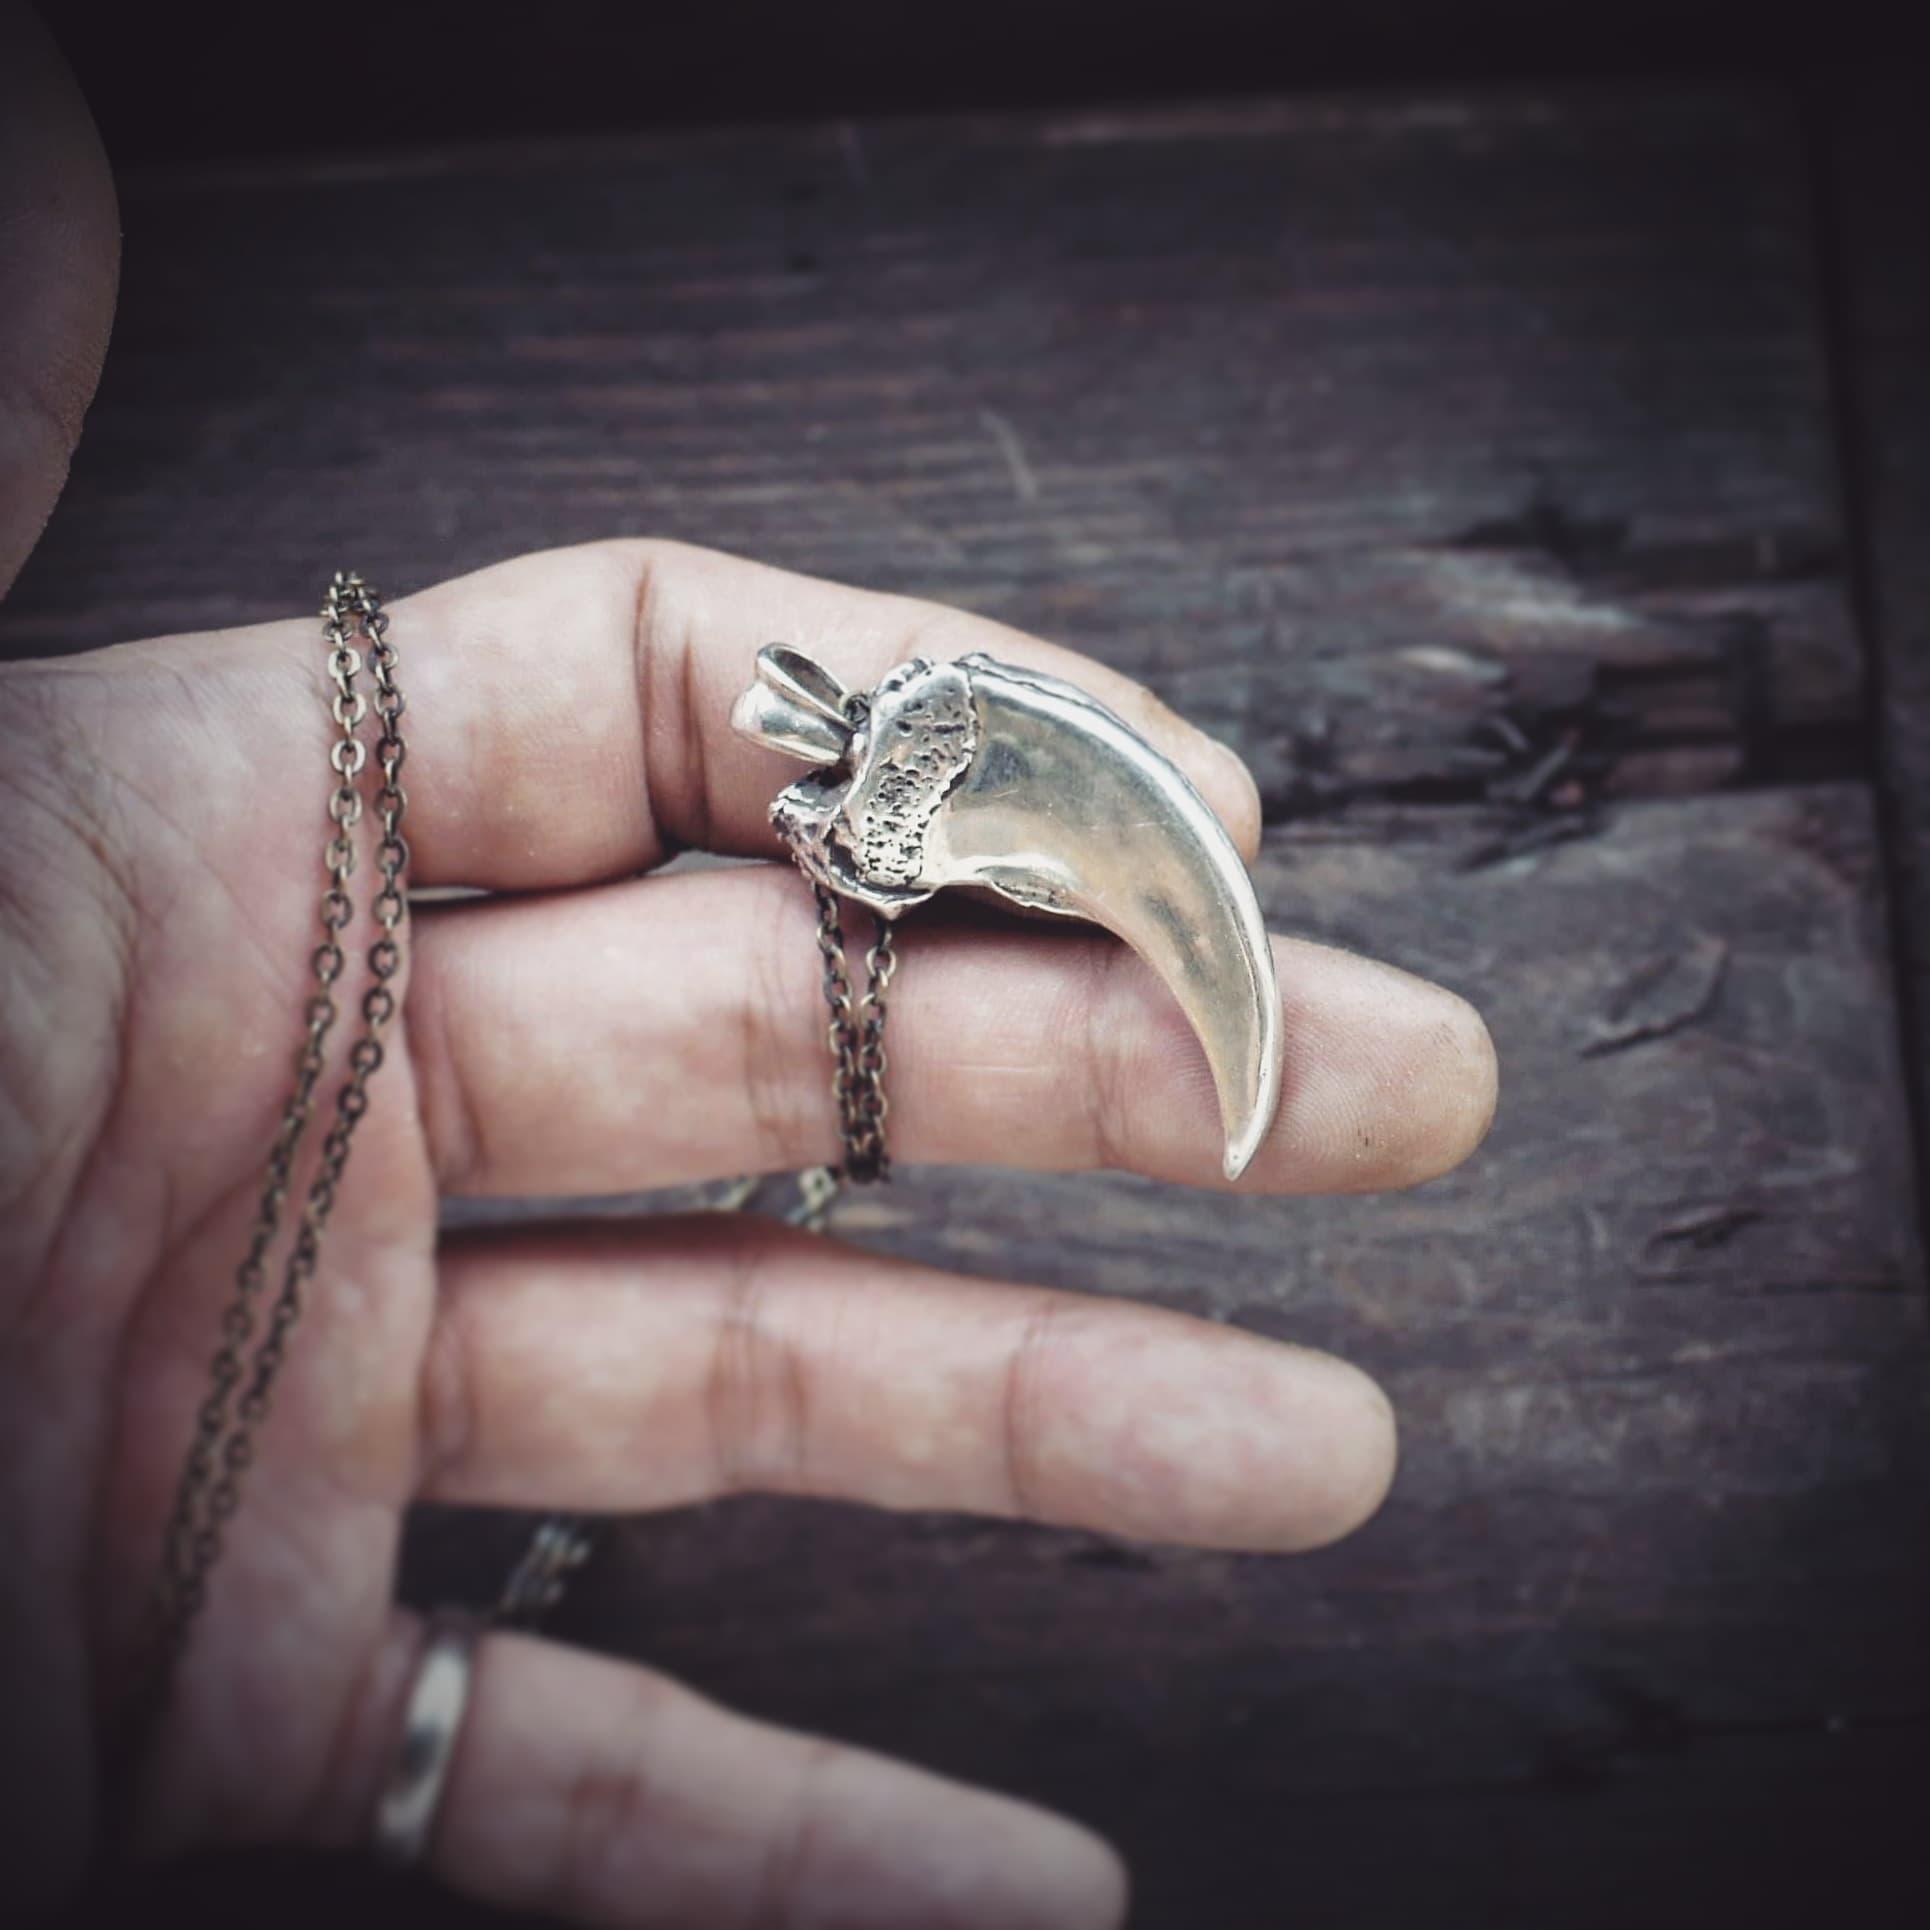 熊爪 925銀單墜 bear claw silver pendant